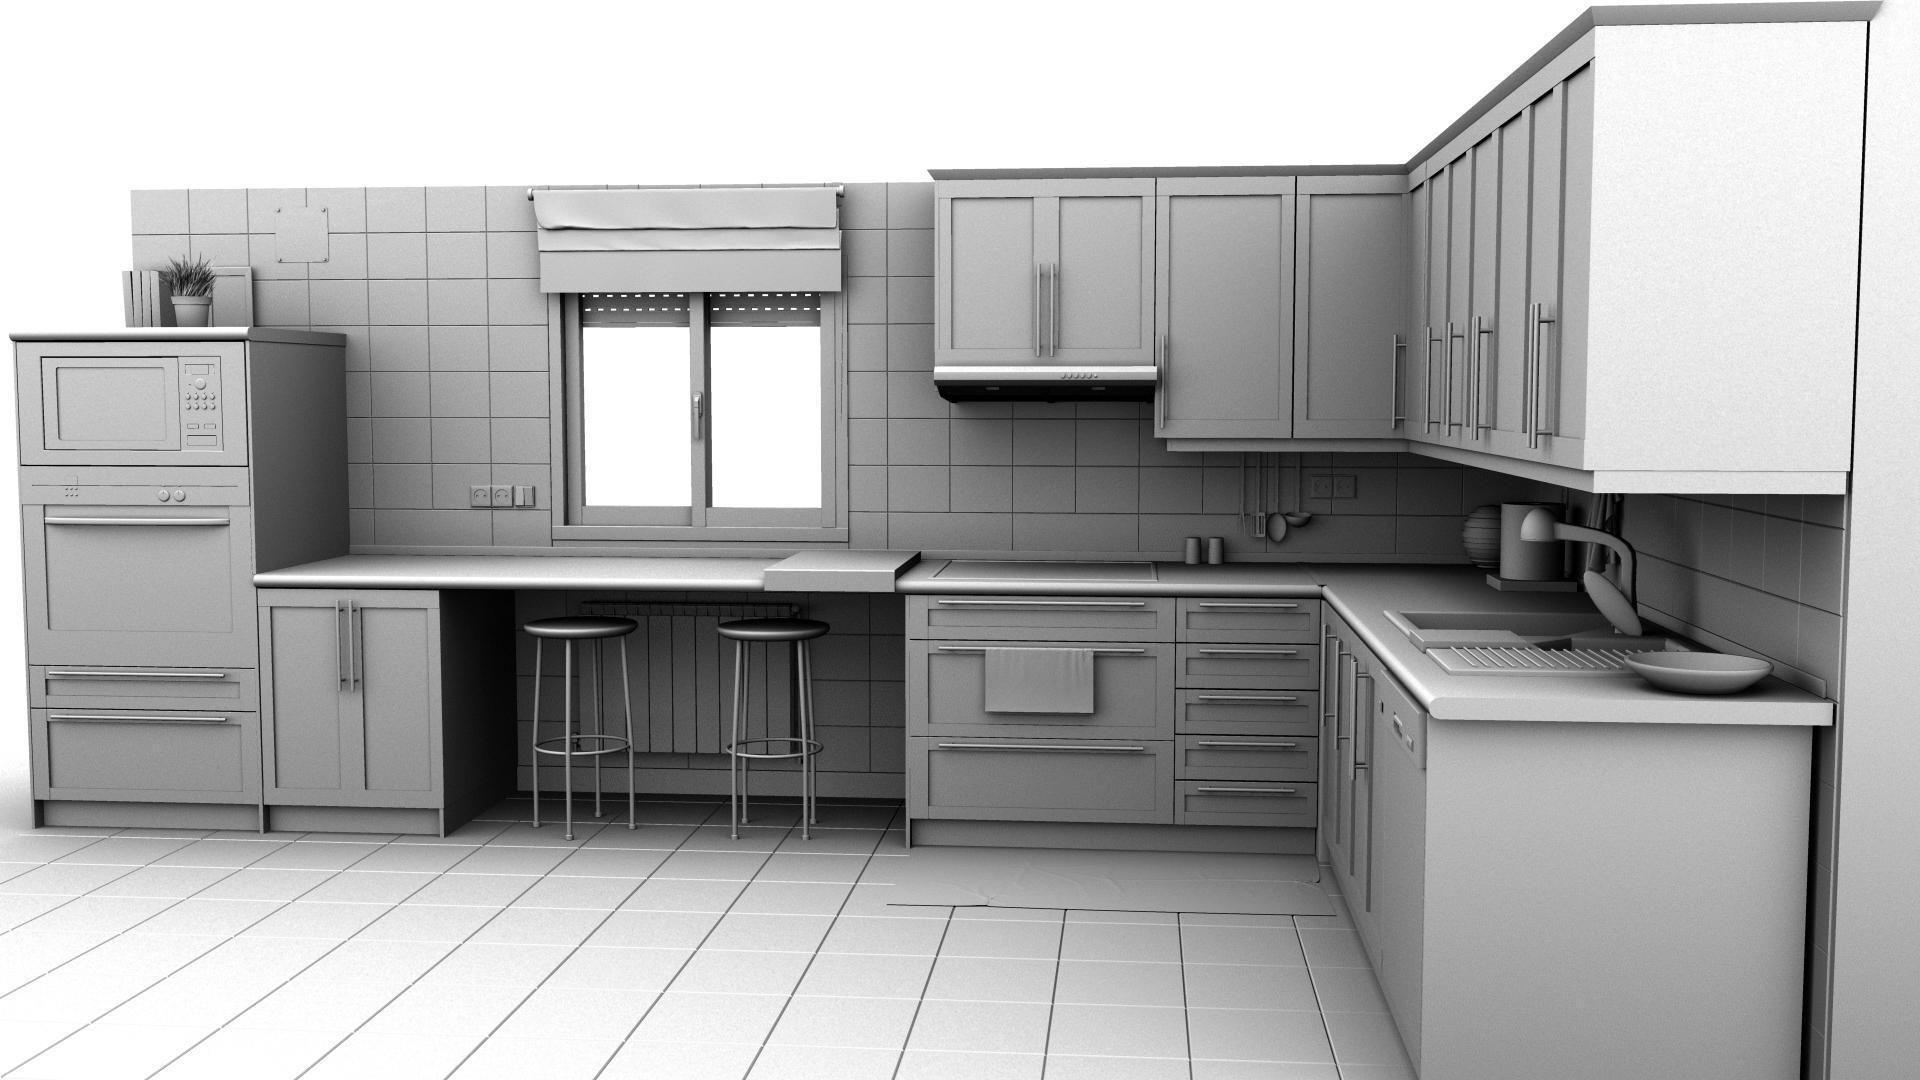 Kitchen hd res 3d model obj fbx ma mb mtl for Model kitchen